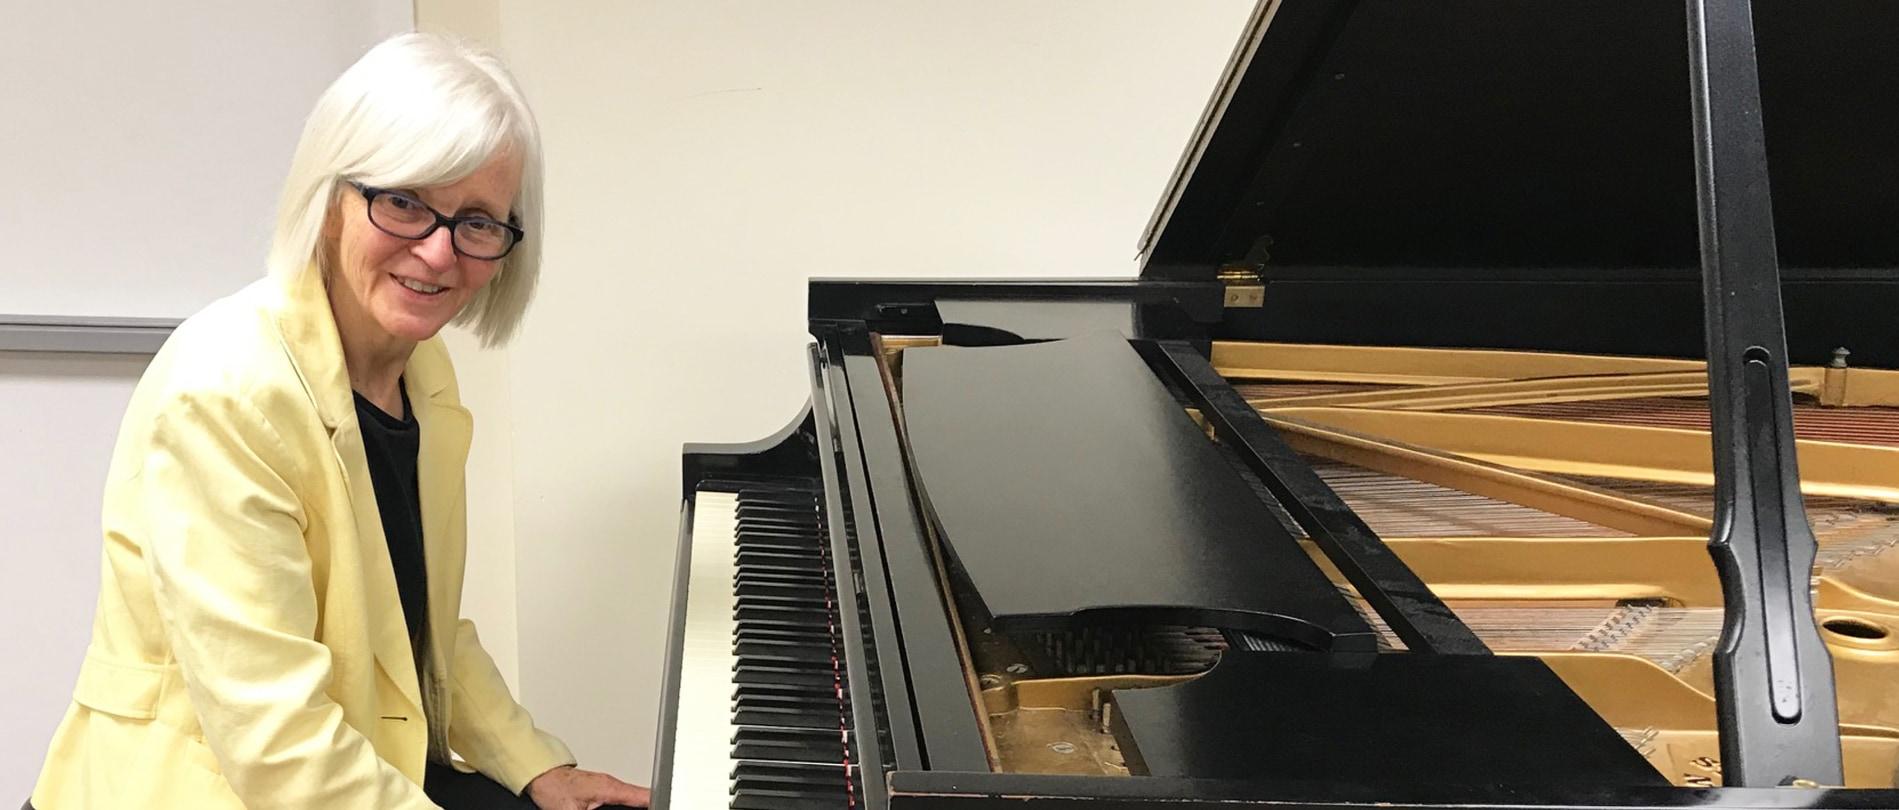 Dominique Haughton, piano student